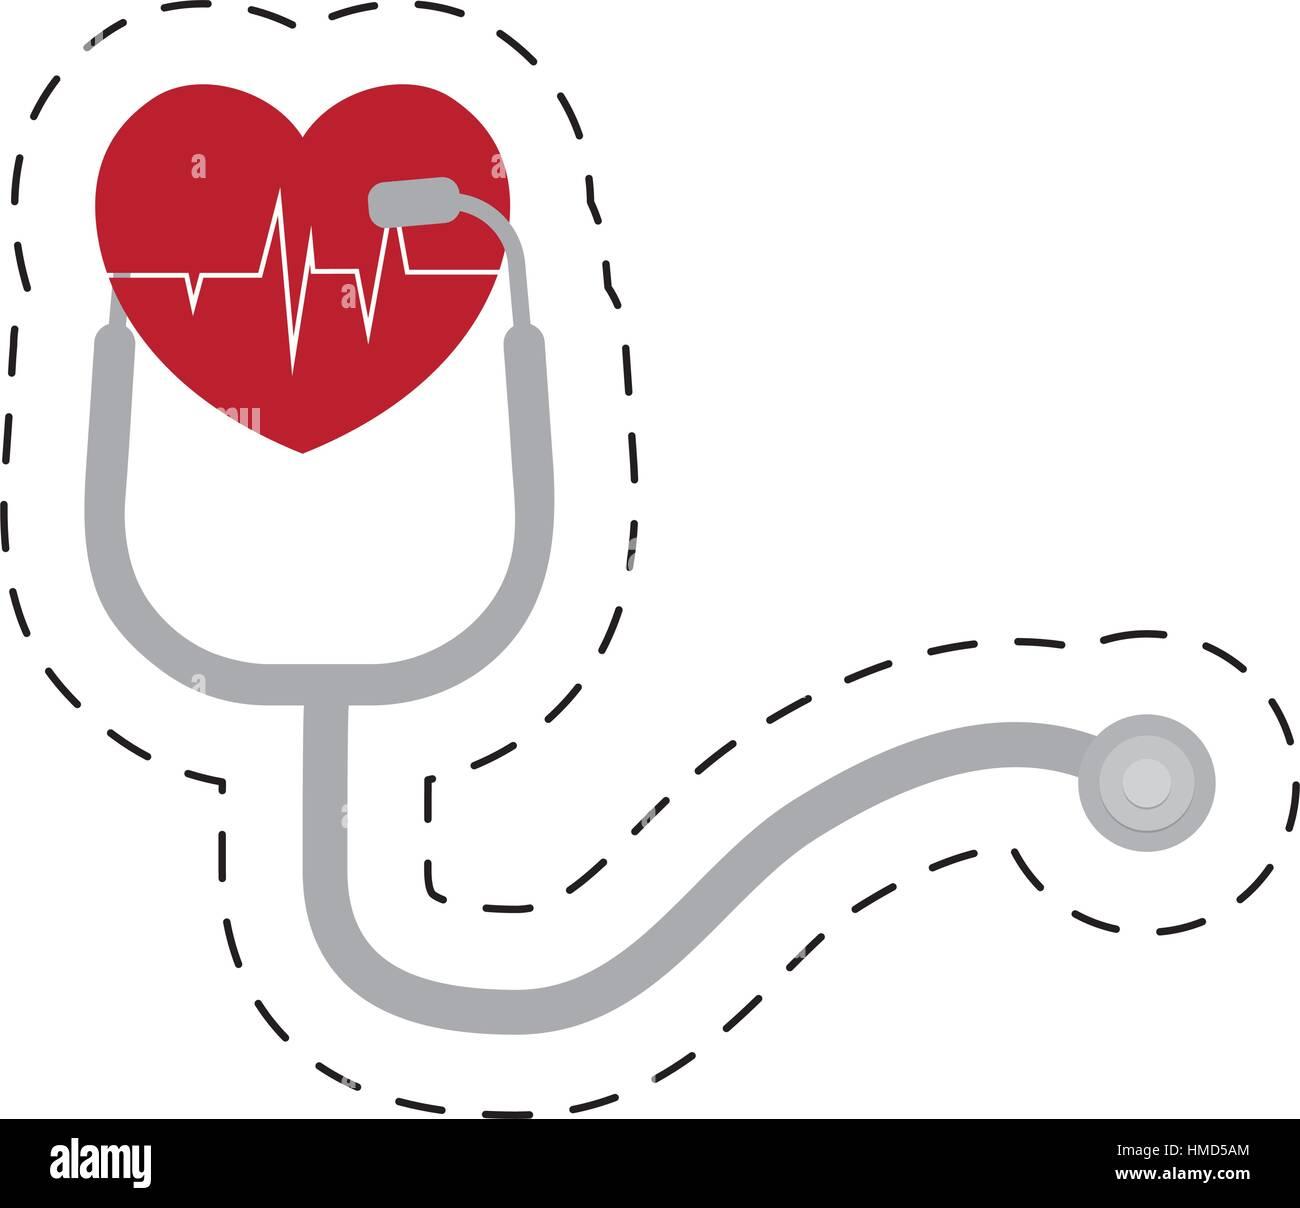 stethoscope pulse heart diagnosis cut line - Stock Image